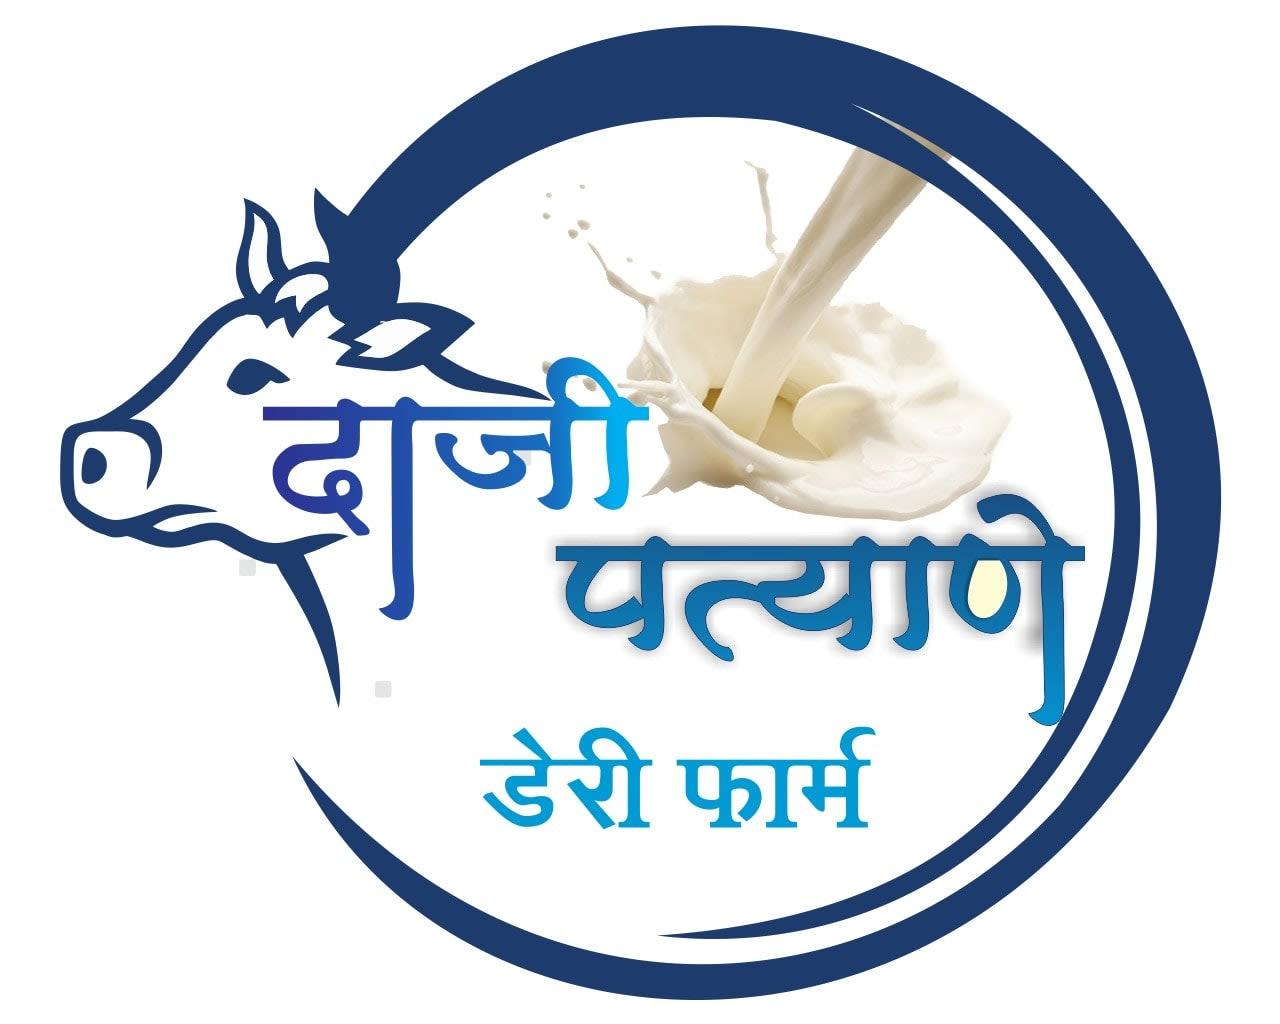 Daji Patyane Dairy Farm